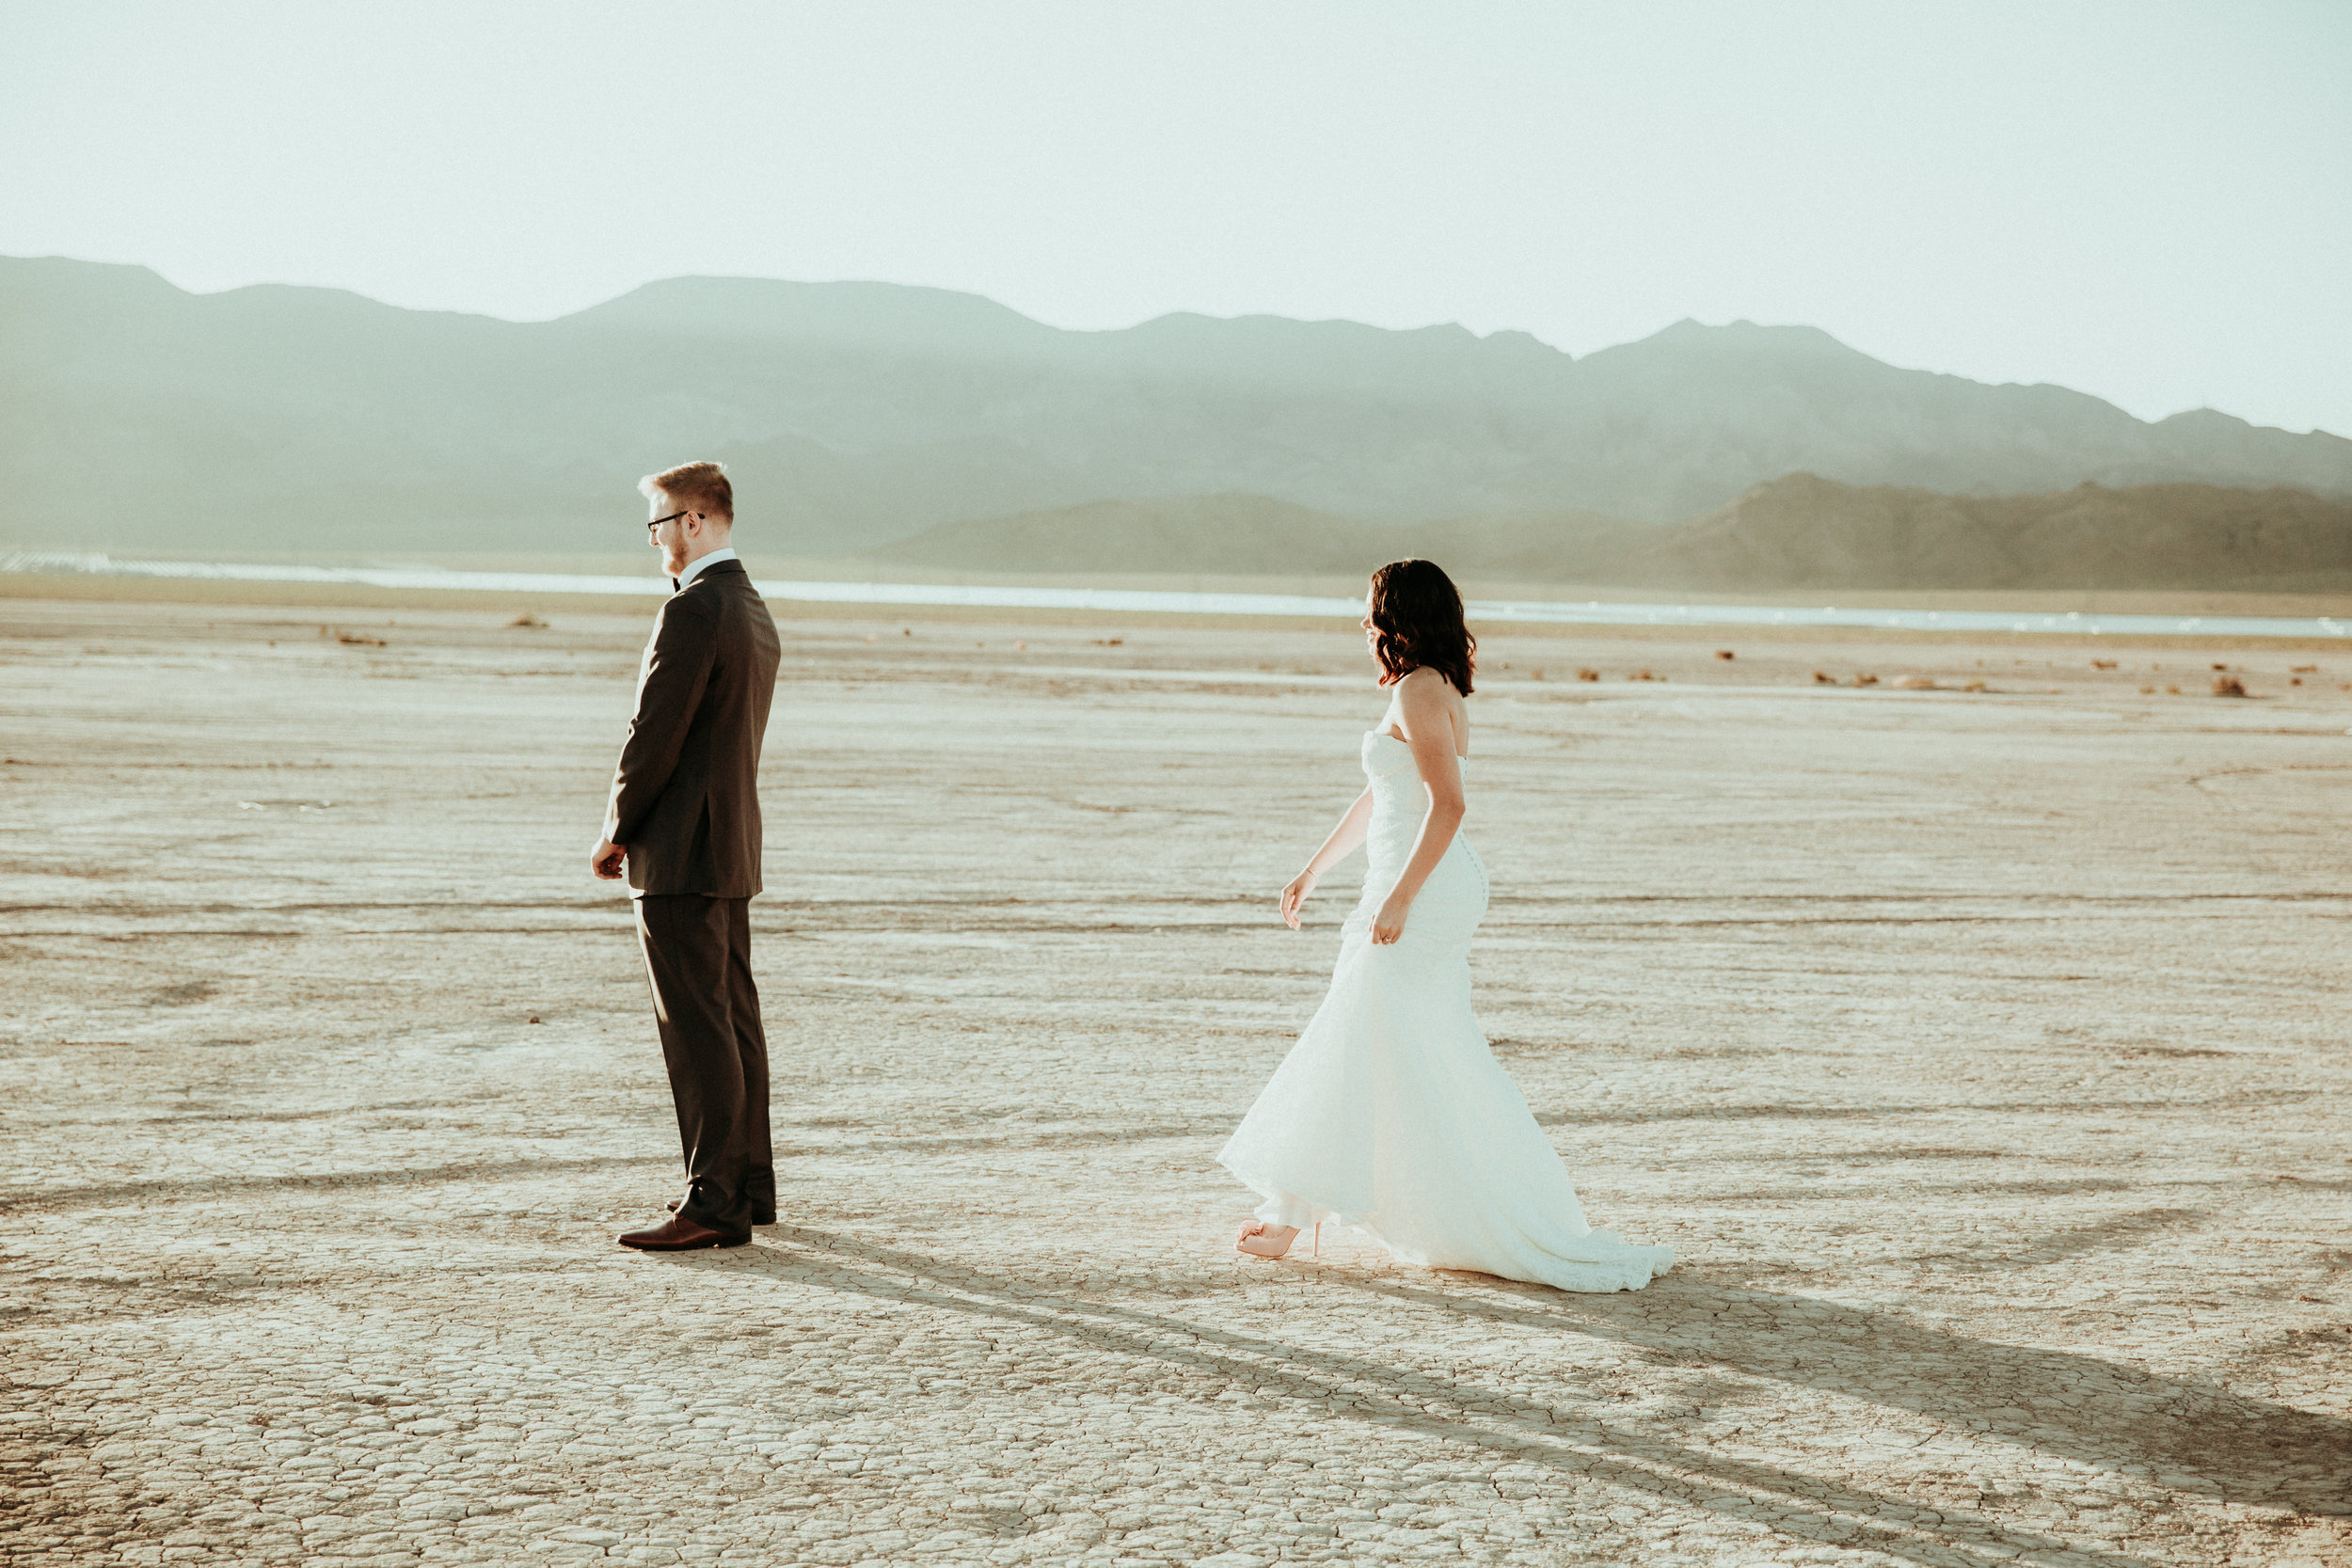 First Look - Seattle Wedding Photographer - Las Vegas Wedding Photography - Dry Lake Bed - Small Intimate Wedding - Rustic Wedding